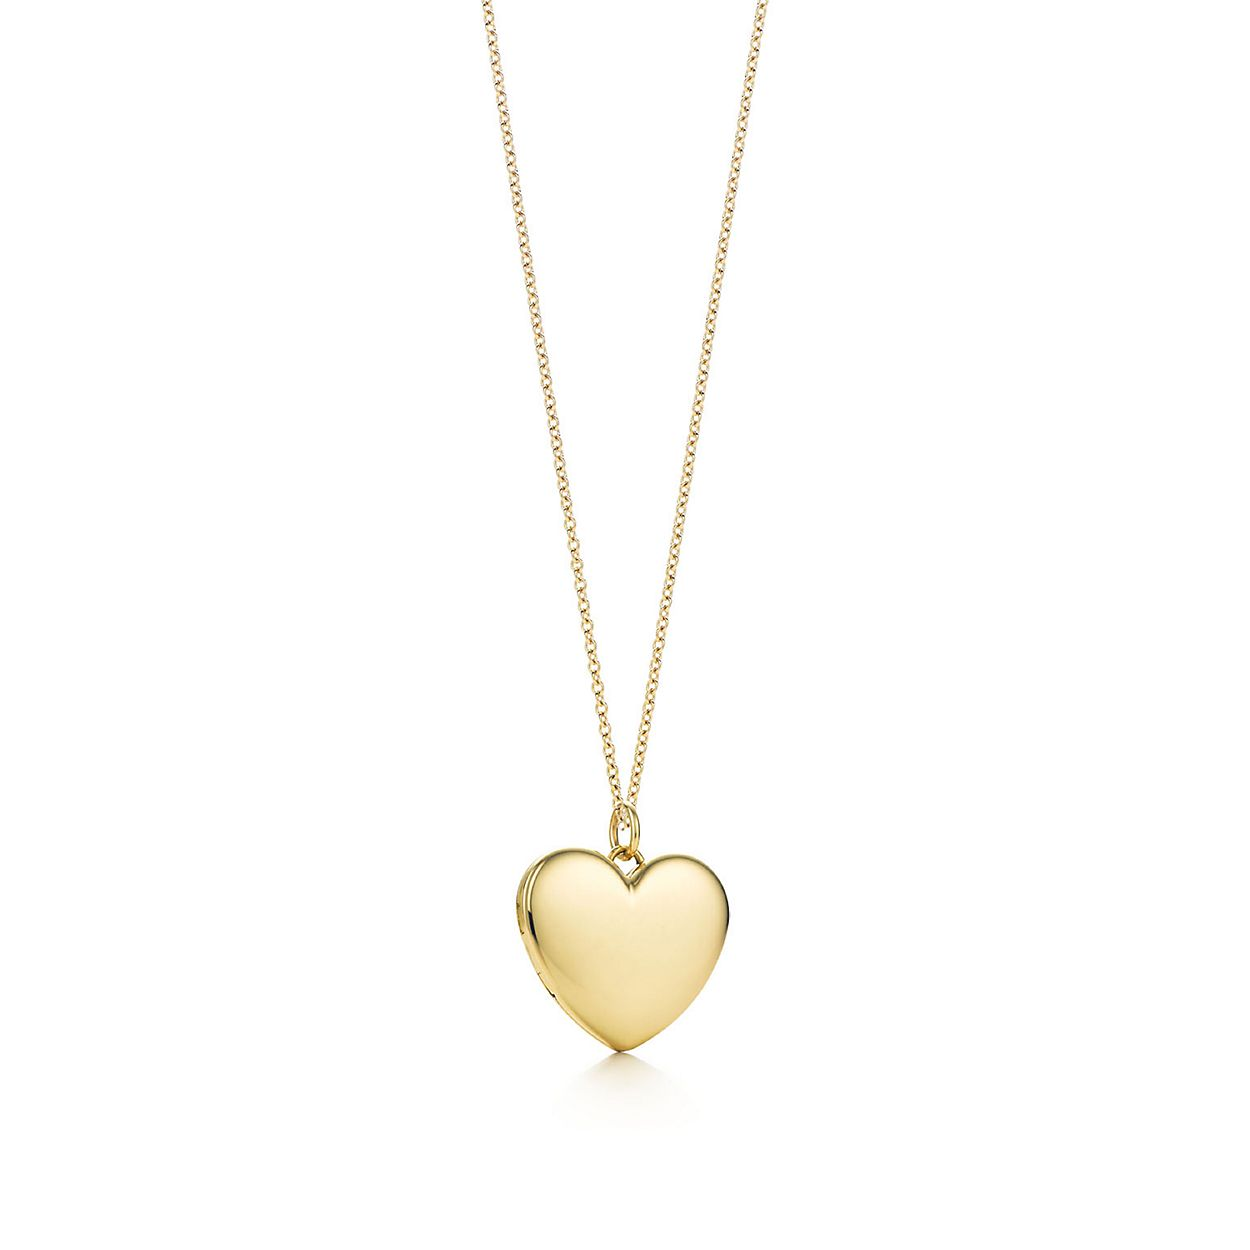 36c9e1208 Heart locket pendant in 18k gold, large. | Tiffany & Co.